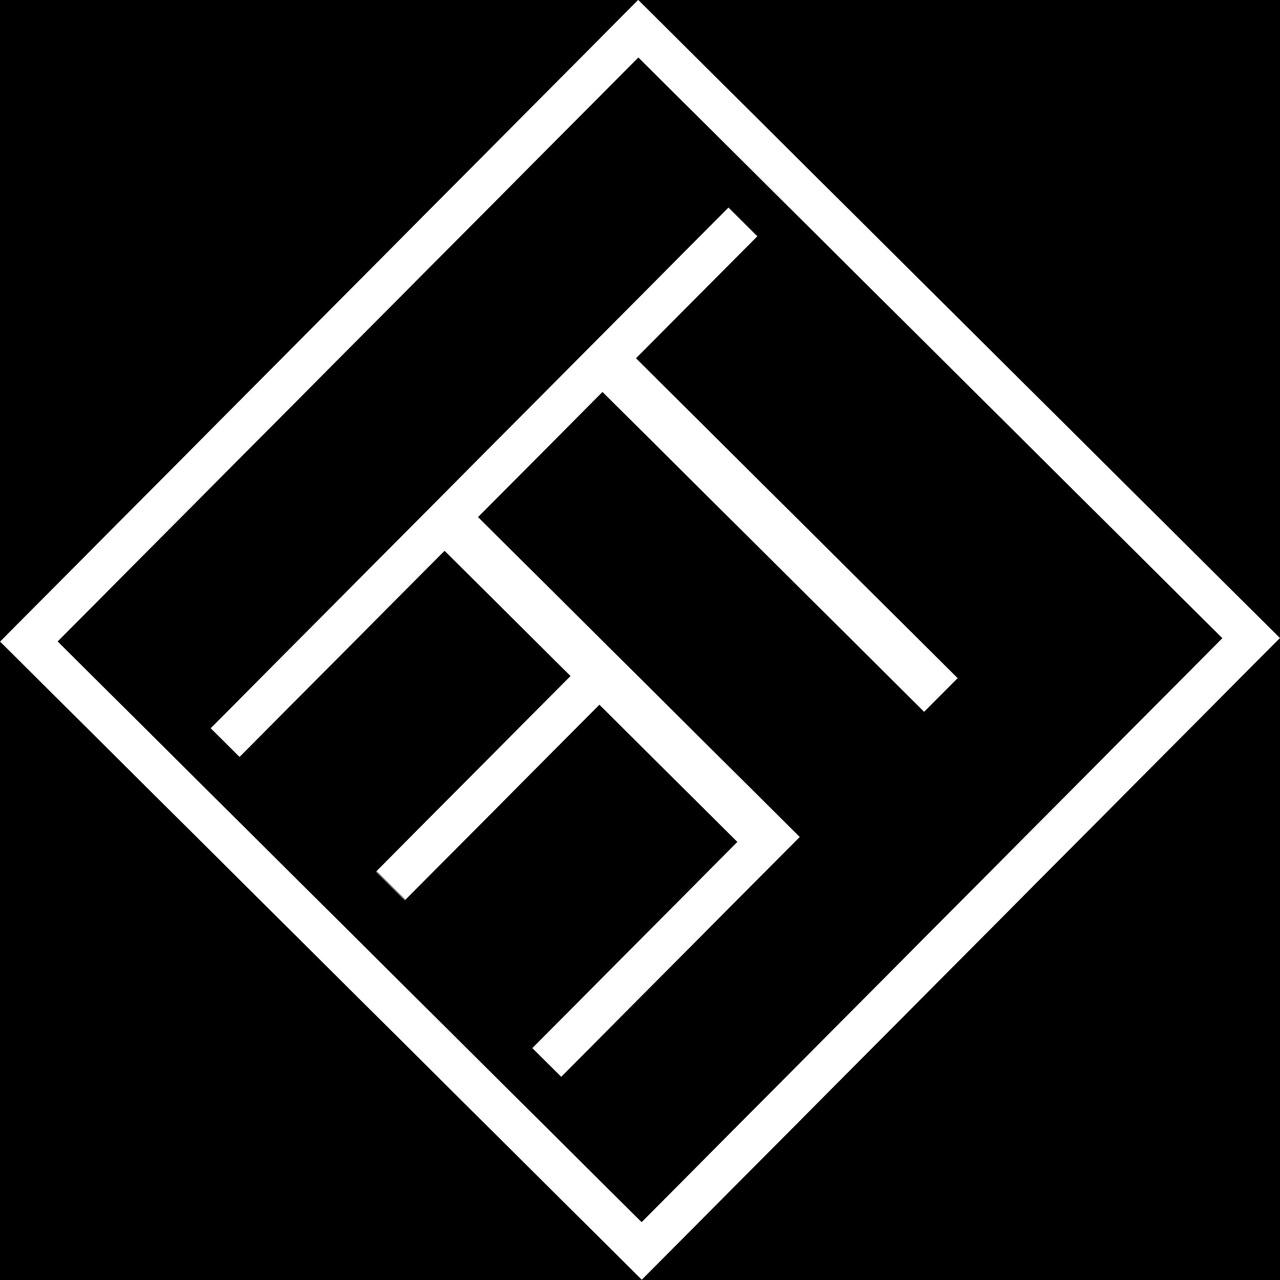 The Attic Podcast: 11. Dj M. - Enfant Terrible - Lesson 52